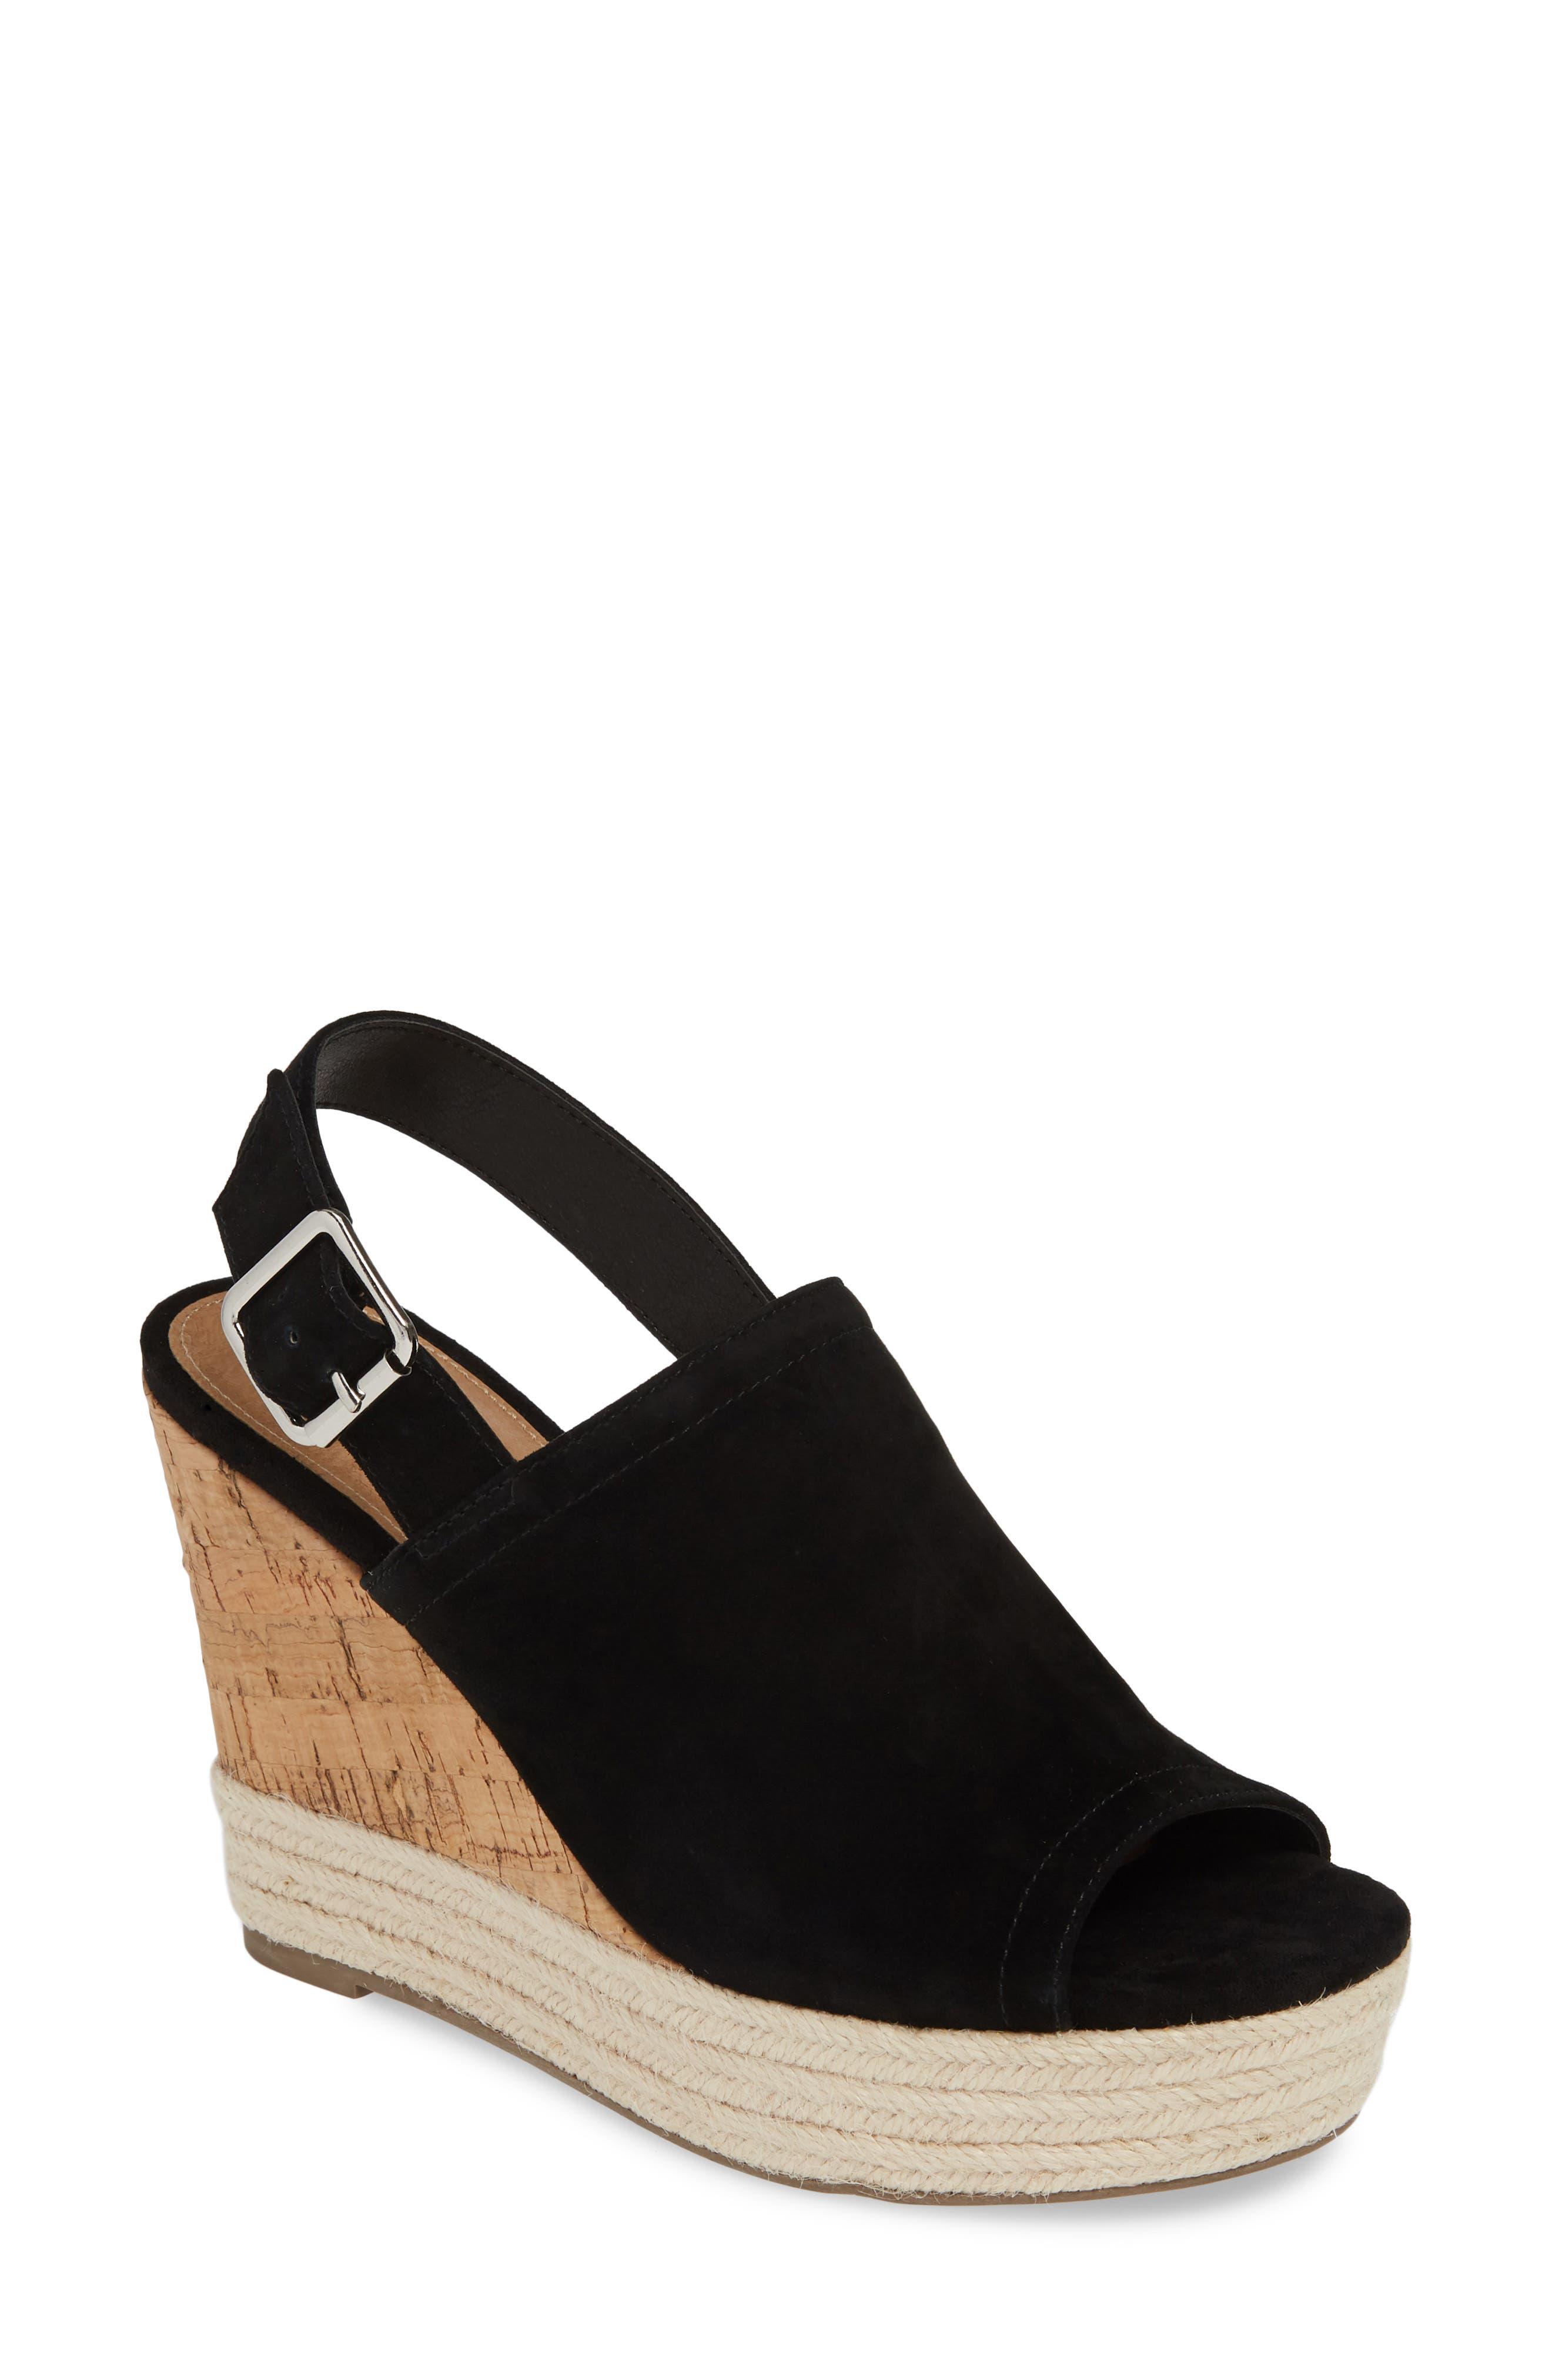 Giver Espadrille Wedge Sandal, Main, color, 015